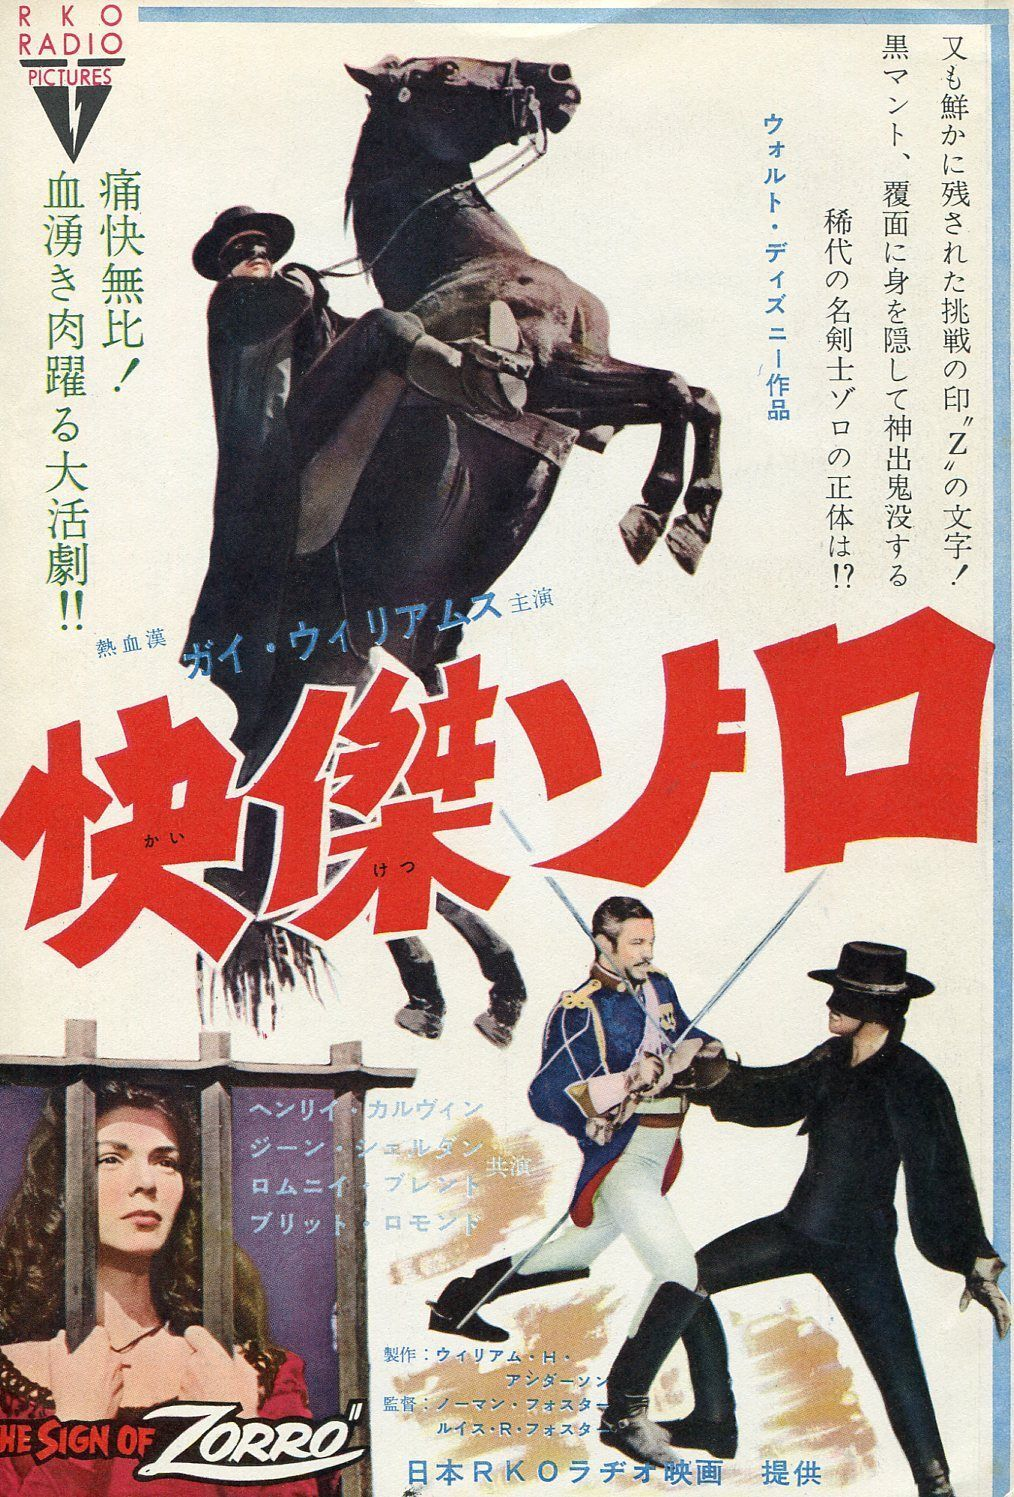 Guy Williams Walt Disney The Sign Of Zorro 1959 Vintage Japan Movie